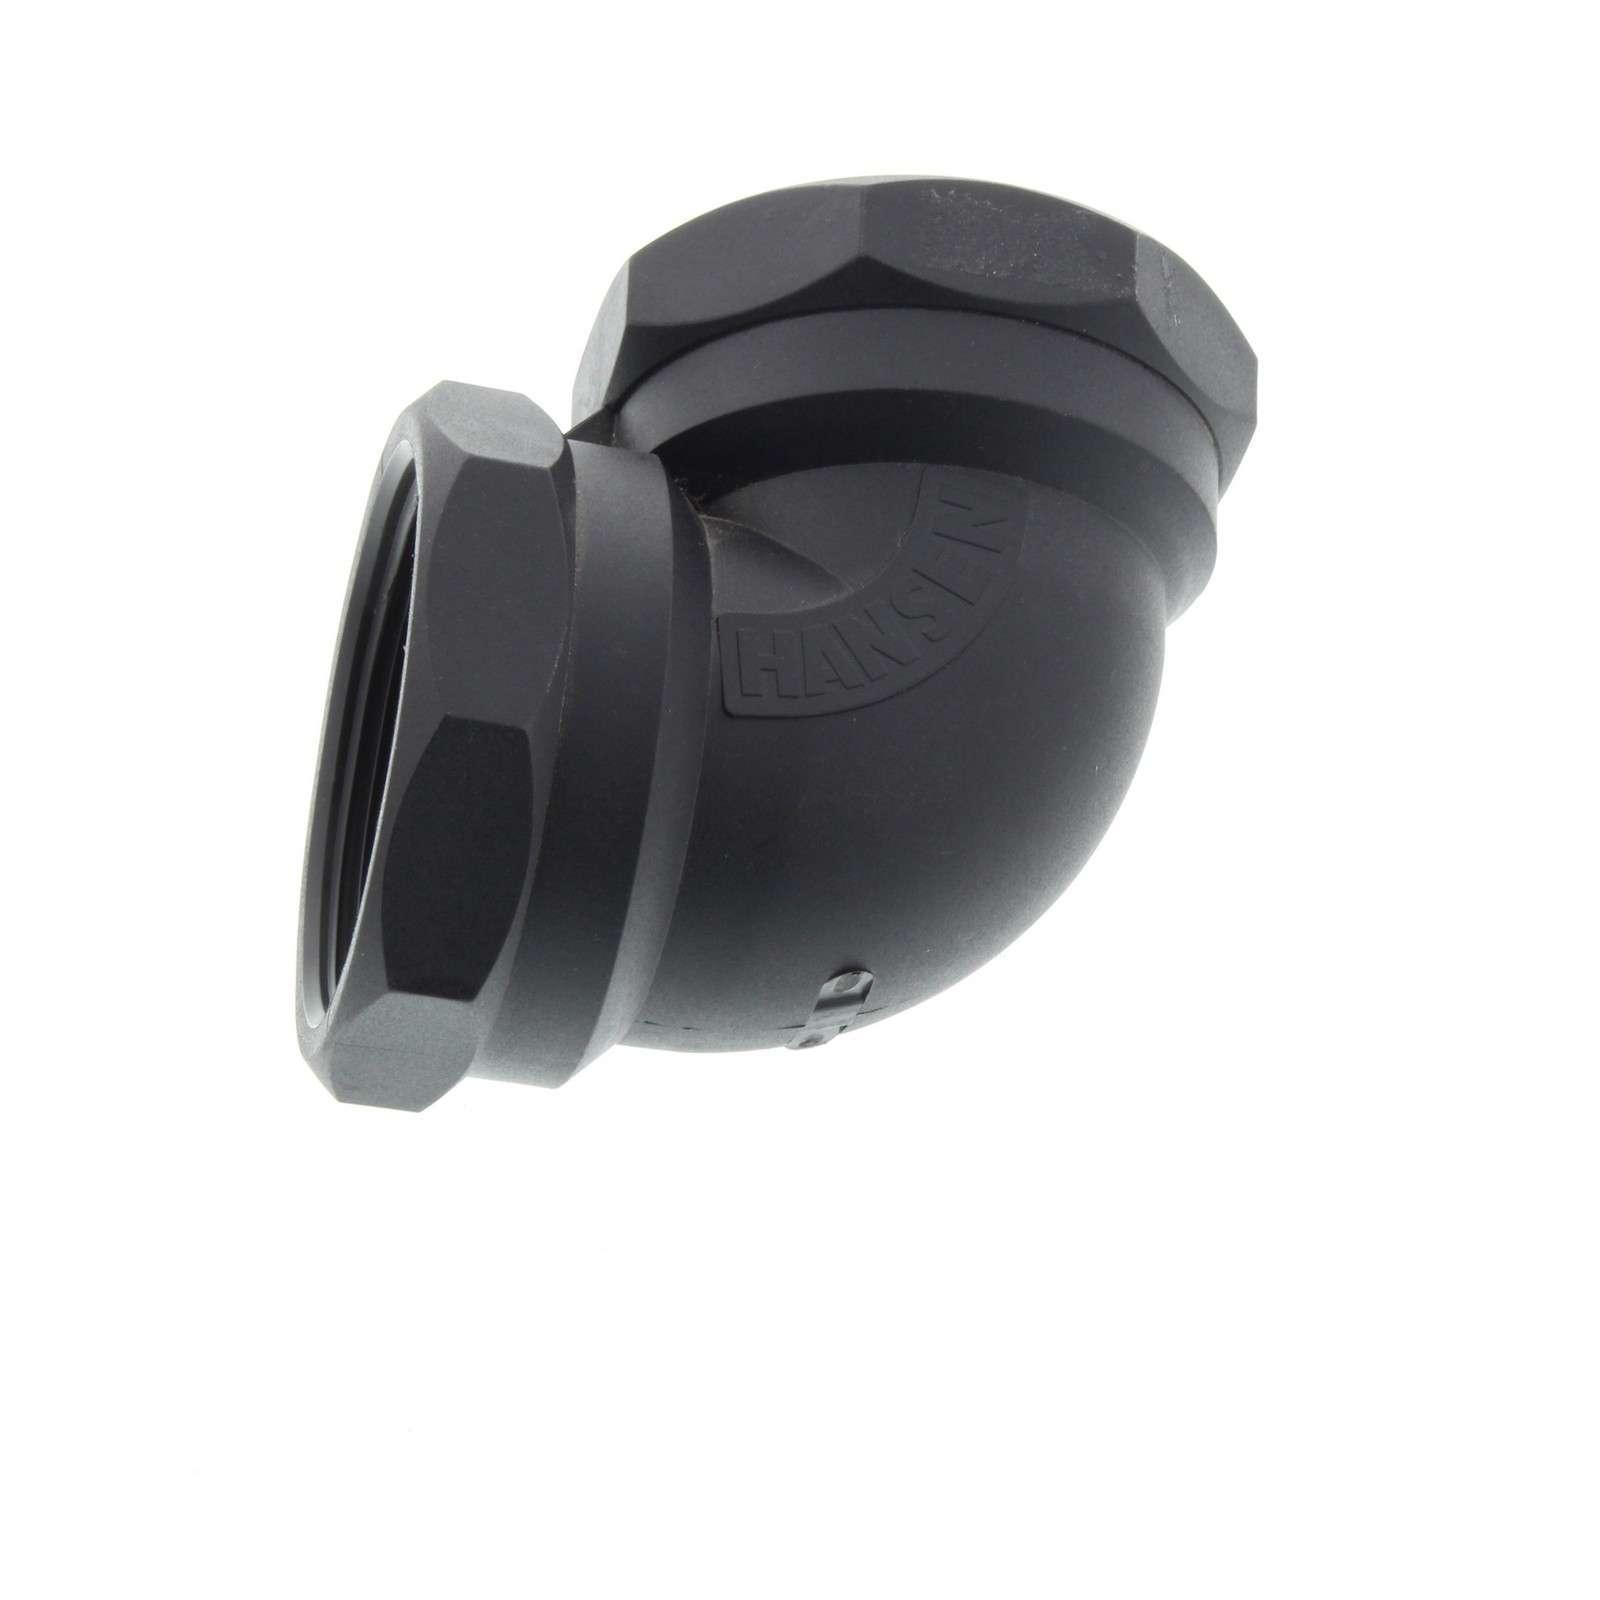 elbow 50mm female 90 degree bsp plumbing irrigation poly fitting water hansen 9414940002047 ebay. Black Bedroom Furniture Sets. Home Design Ideas